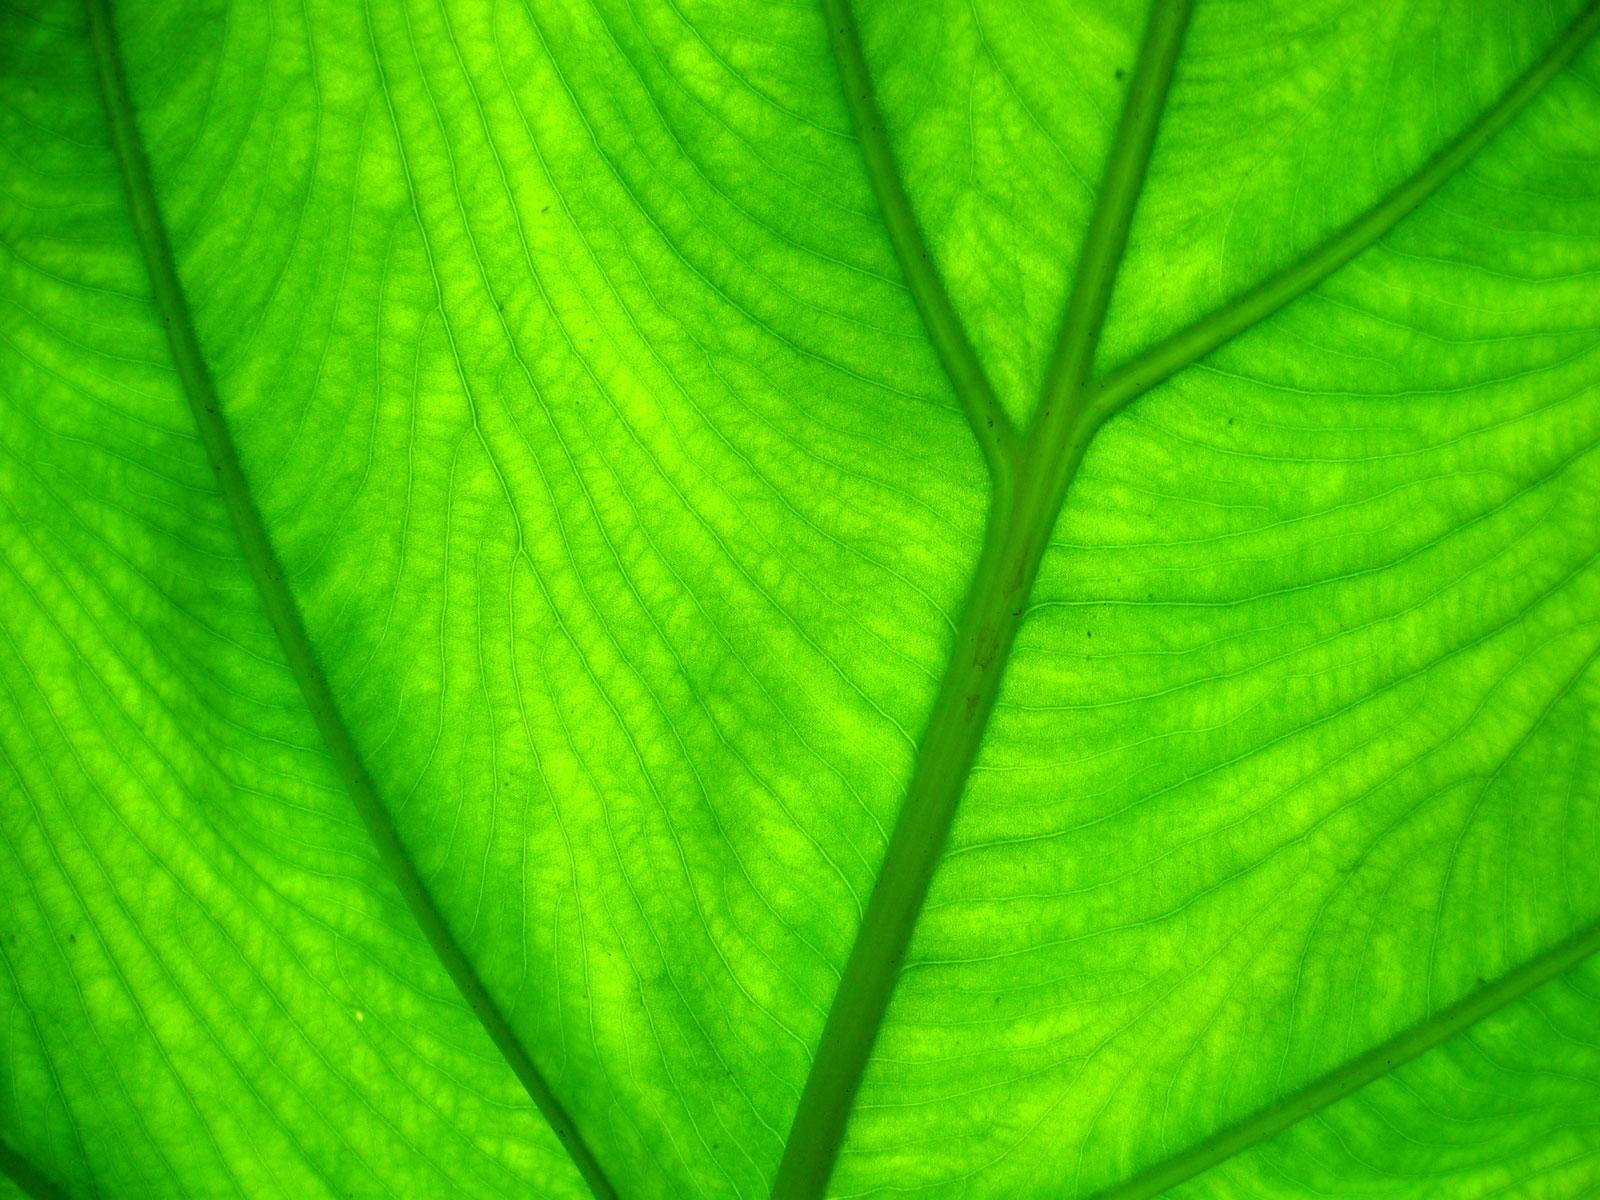 Groene achtergronden hd wallpapers for Green pflanzen